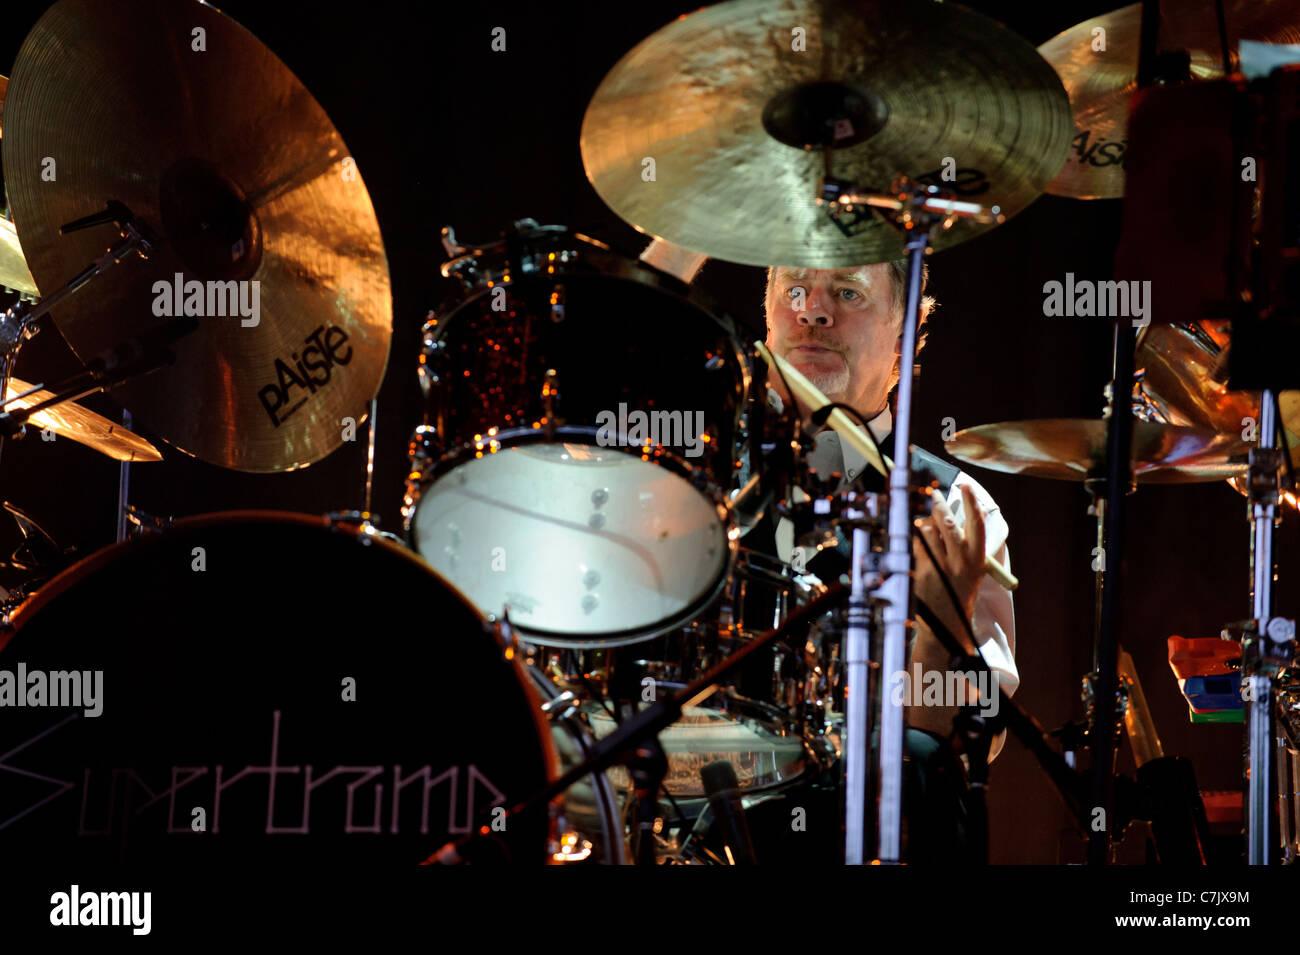 Legendary British rock band Supertramp performs live at Molson Amphitheatre, Toronto, Canada on June 12, 2011 - Stock Image